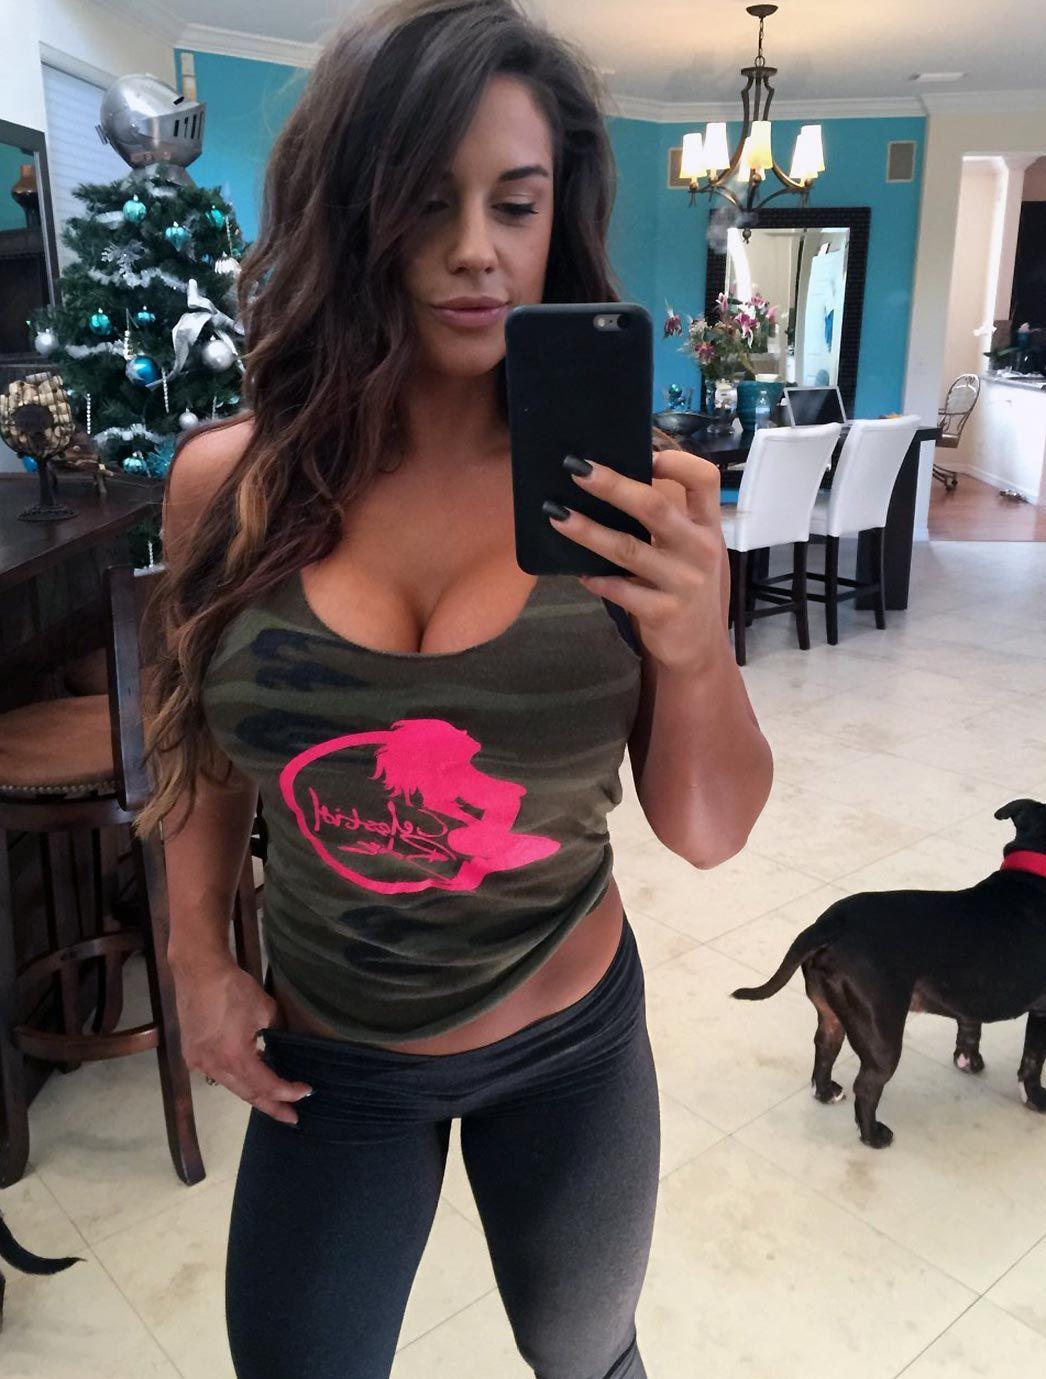 Celeste Bonin Nude Leaked The Fappening & Sexy 0240